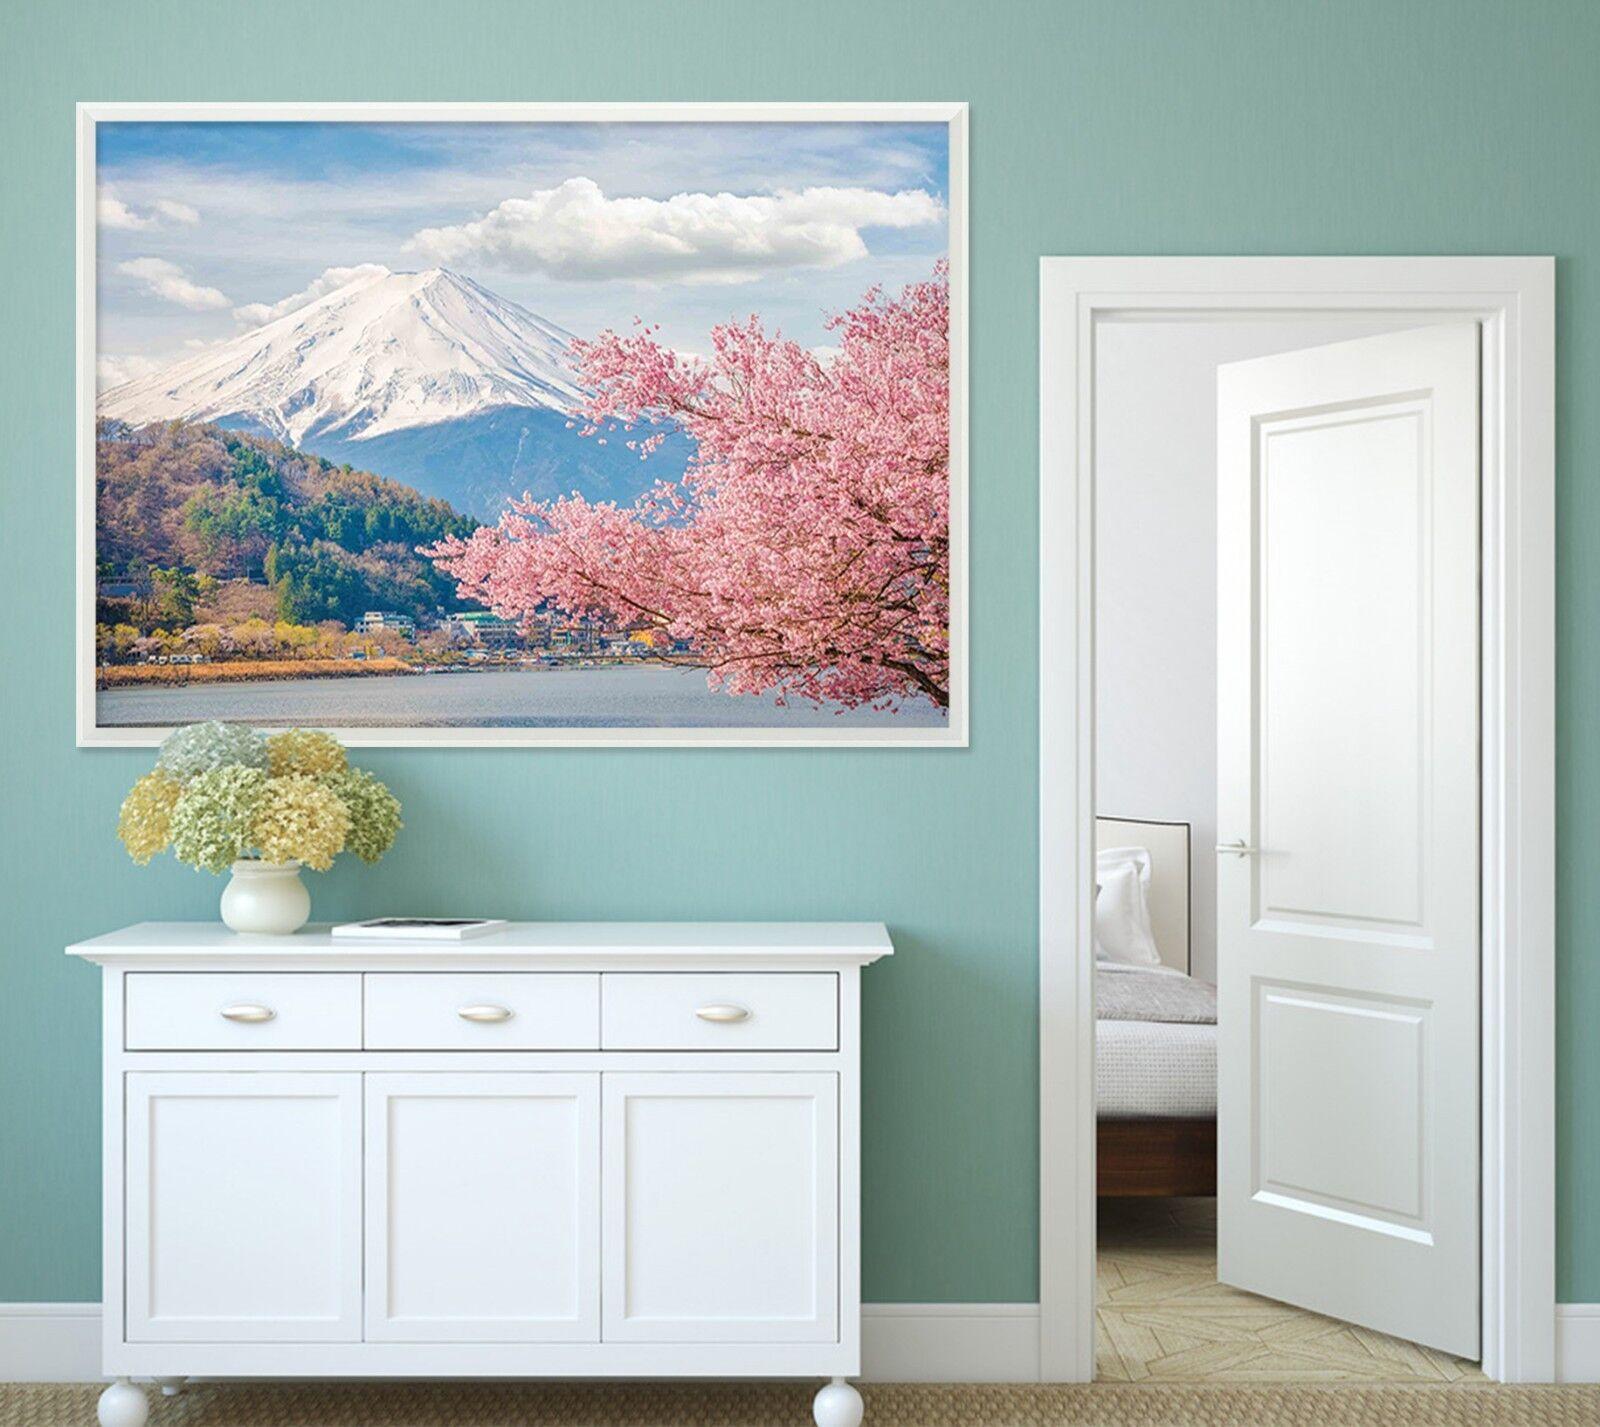 3D Mount Fuji Scenery 1 Framed Poster Home Decor Print Painting Art AJ WALLPAPER